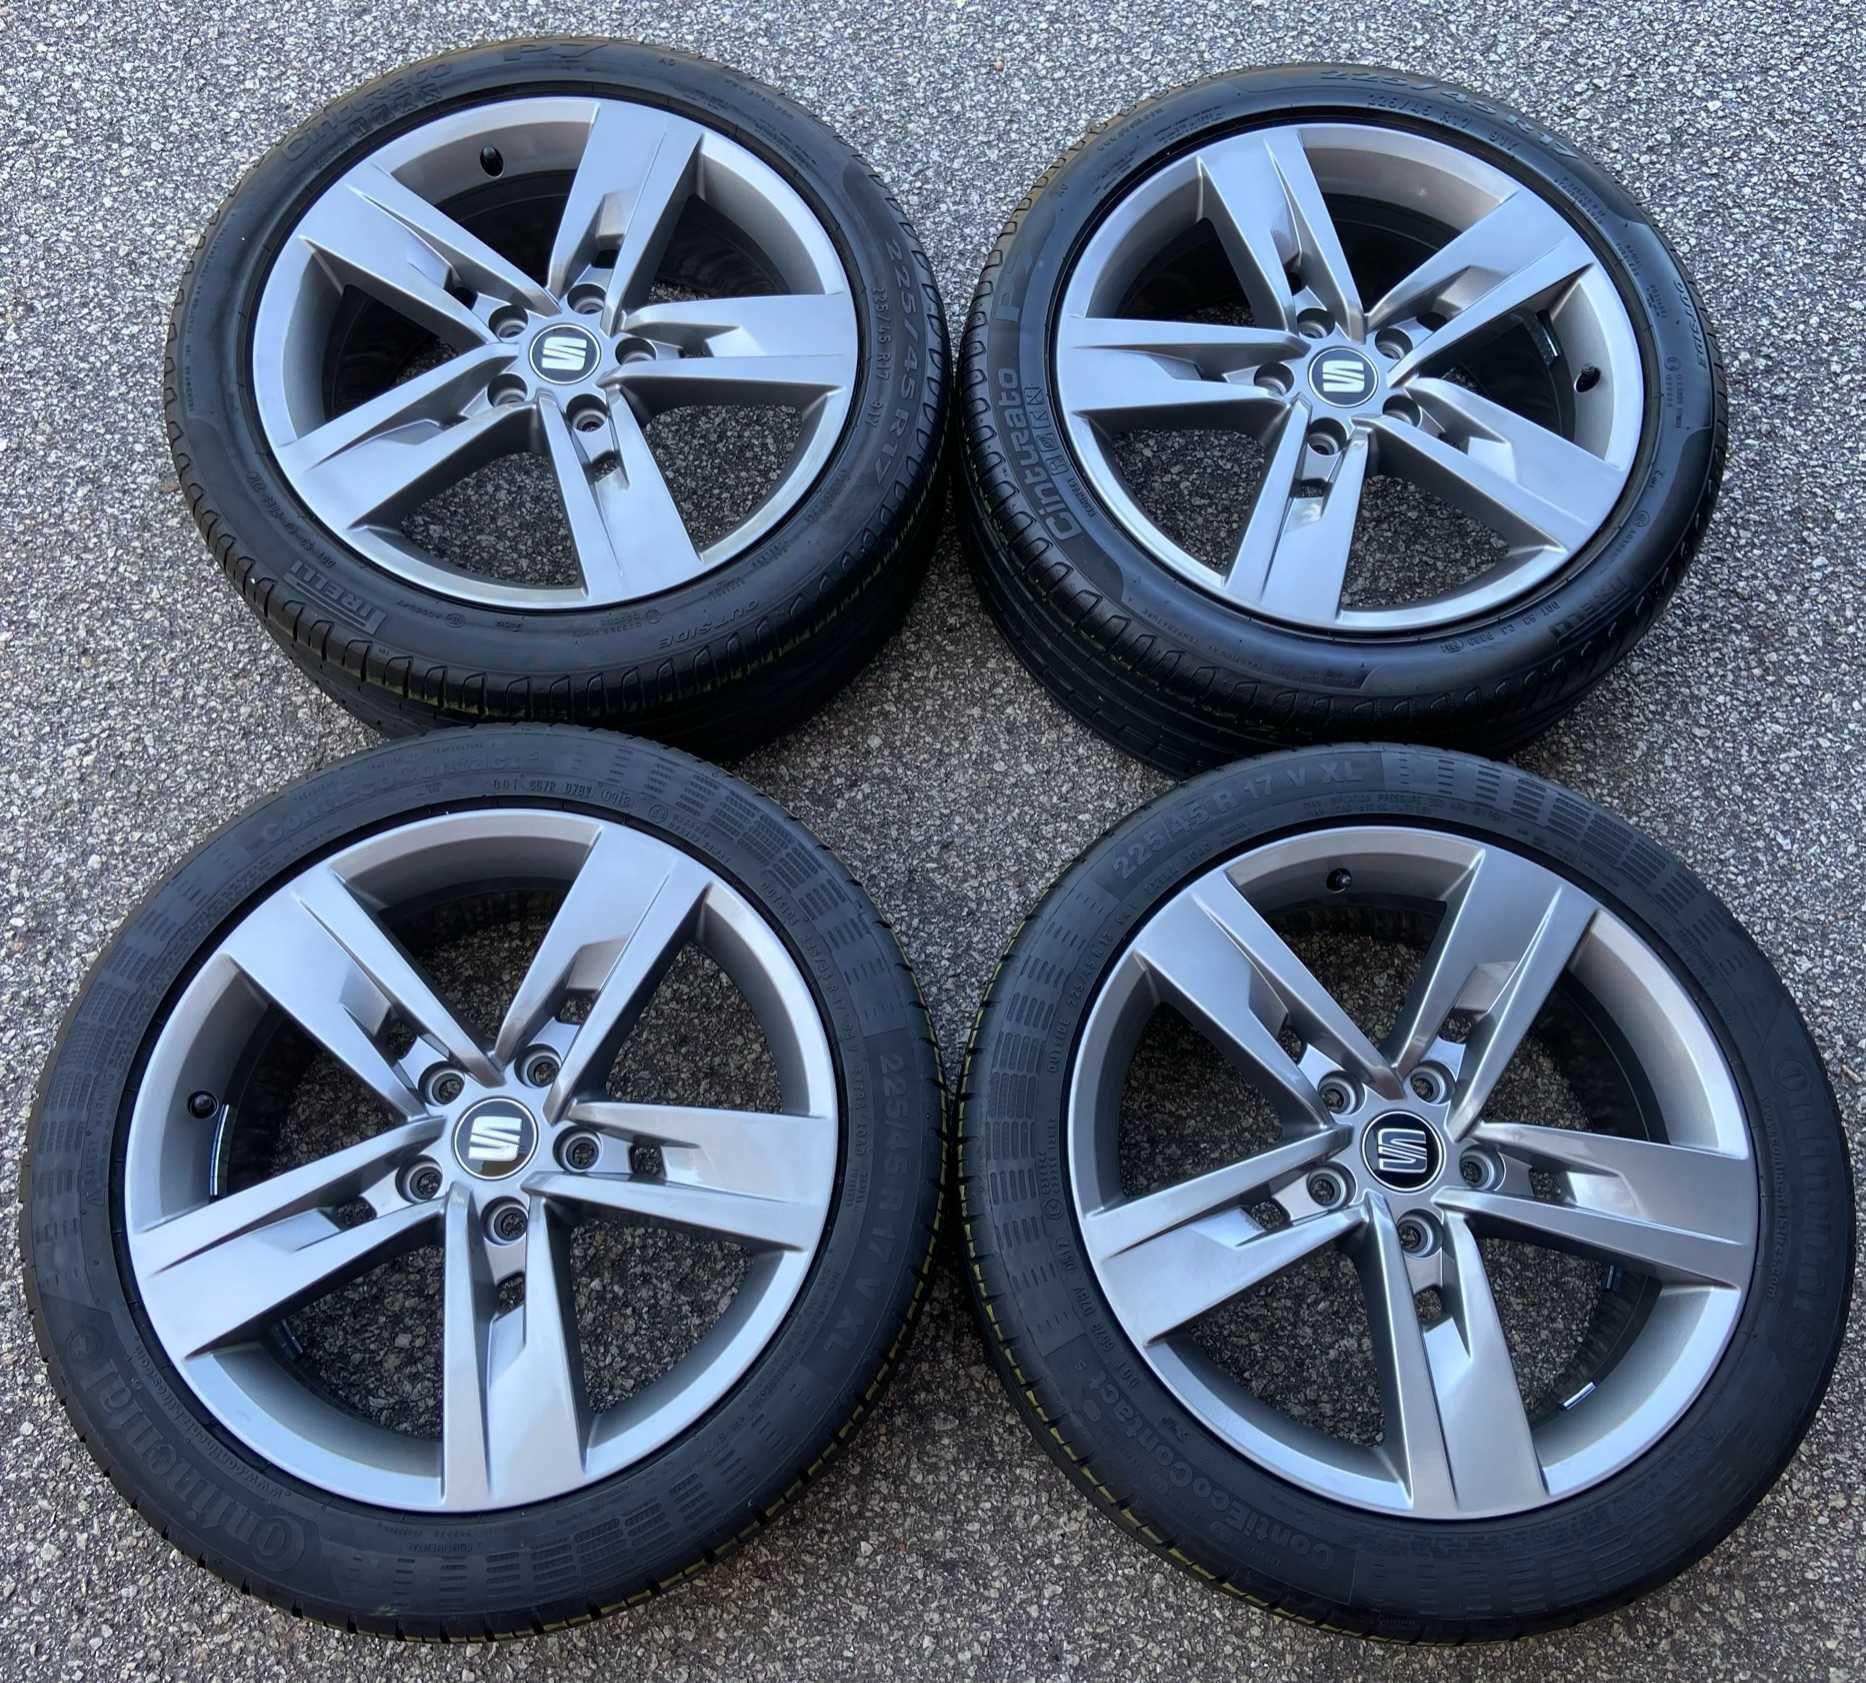 Jantes 17 5x112 Seat Leon FR C/ Pneus 225 45 R17